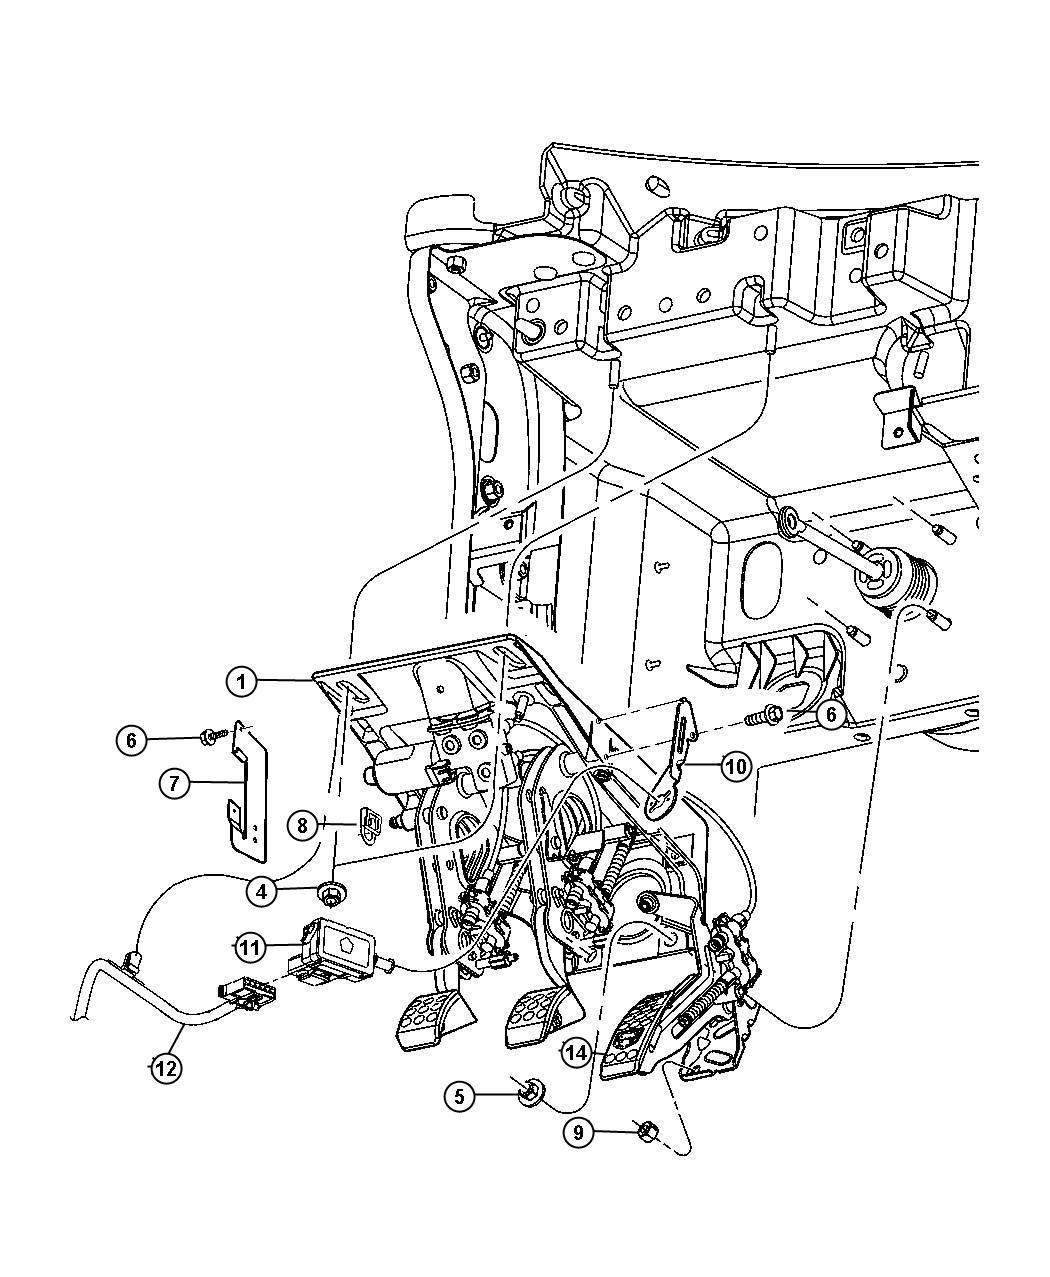 Dodge Durango Bracket. Wiring harness. Up to [08/11/03